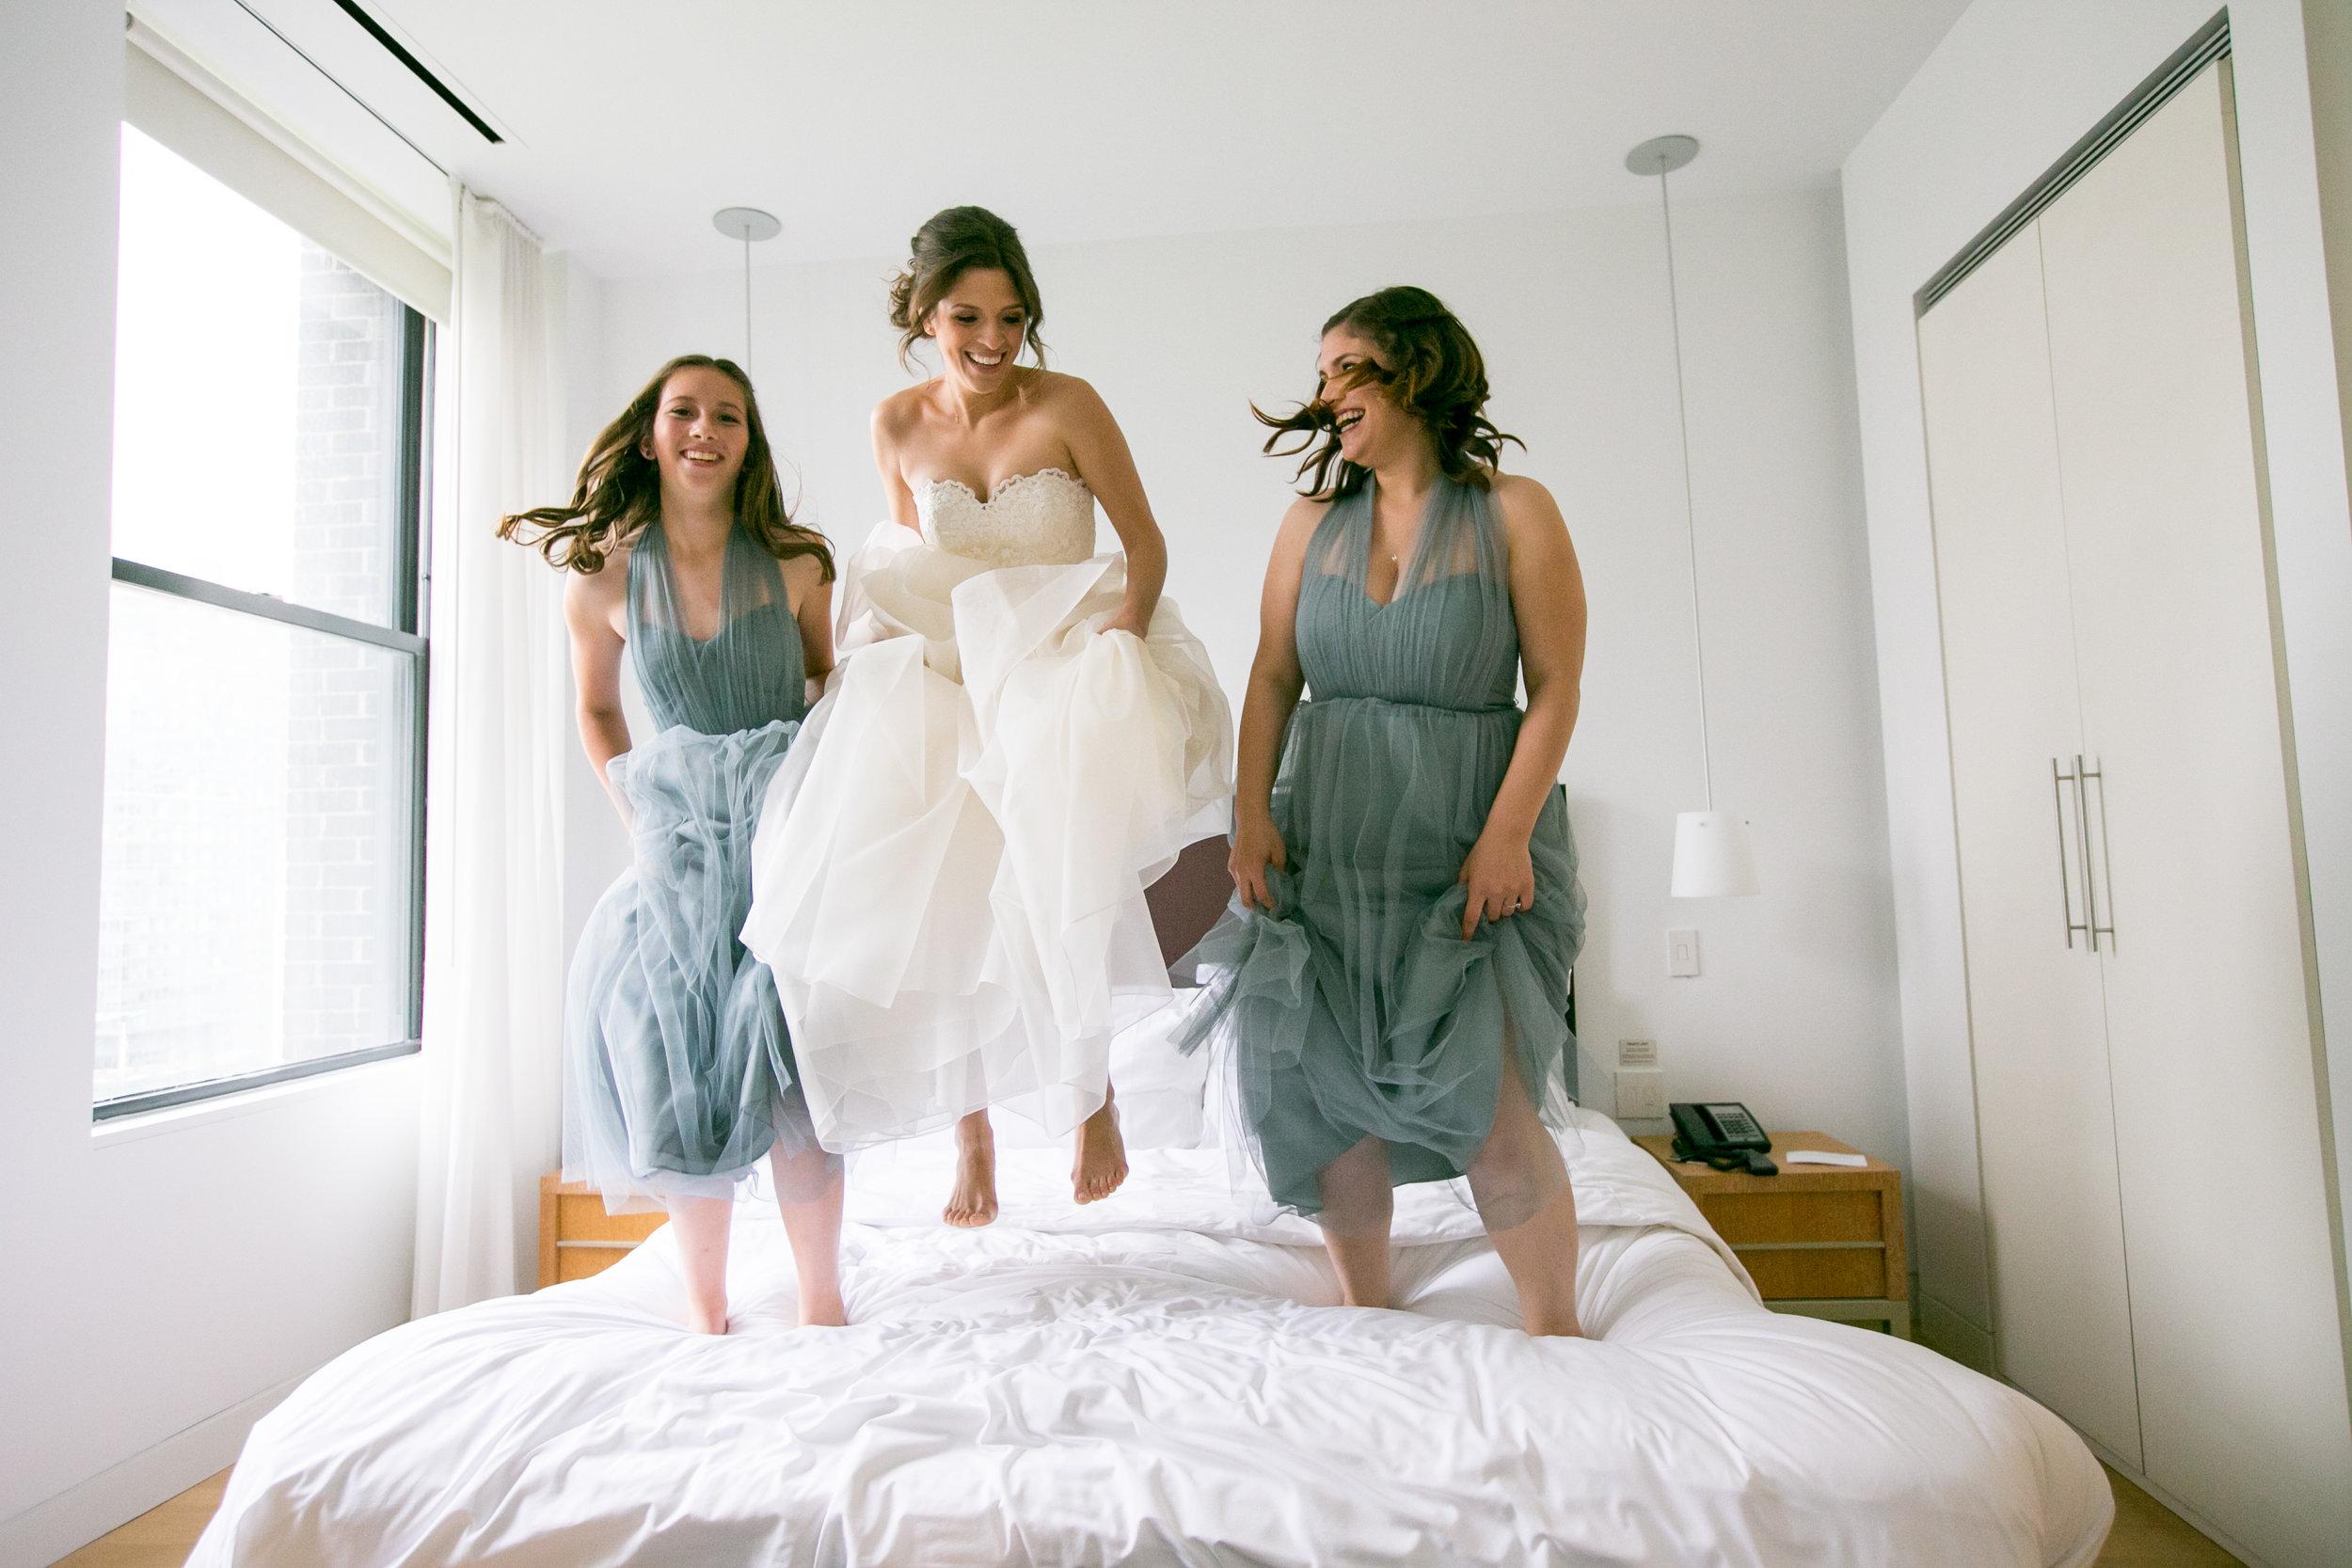 bridesmaid wedding photography 0001